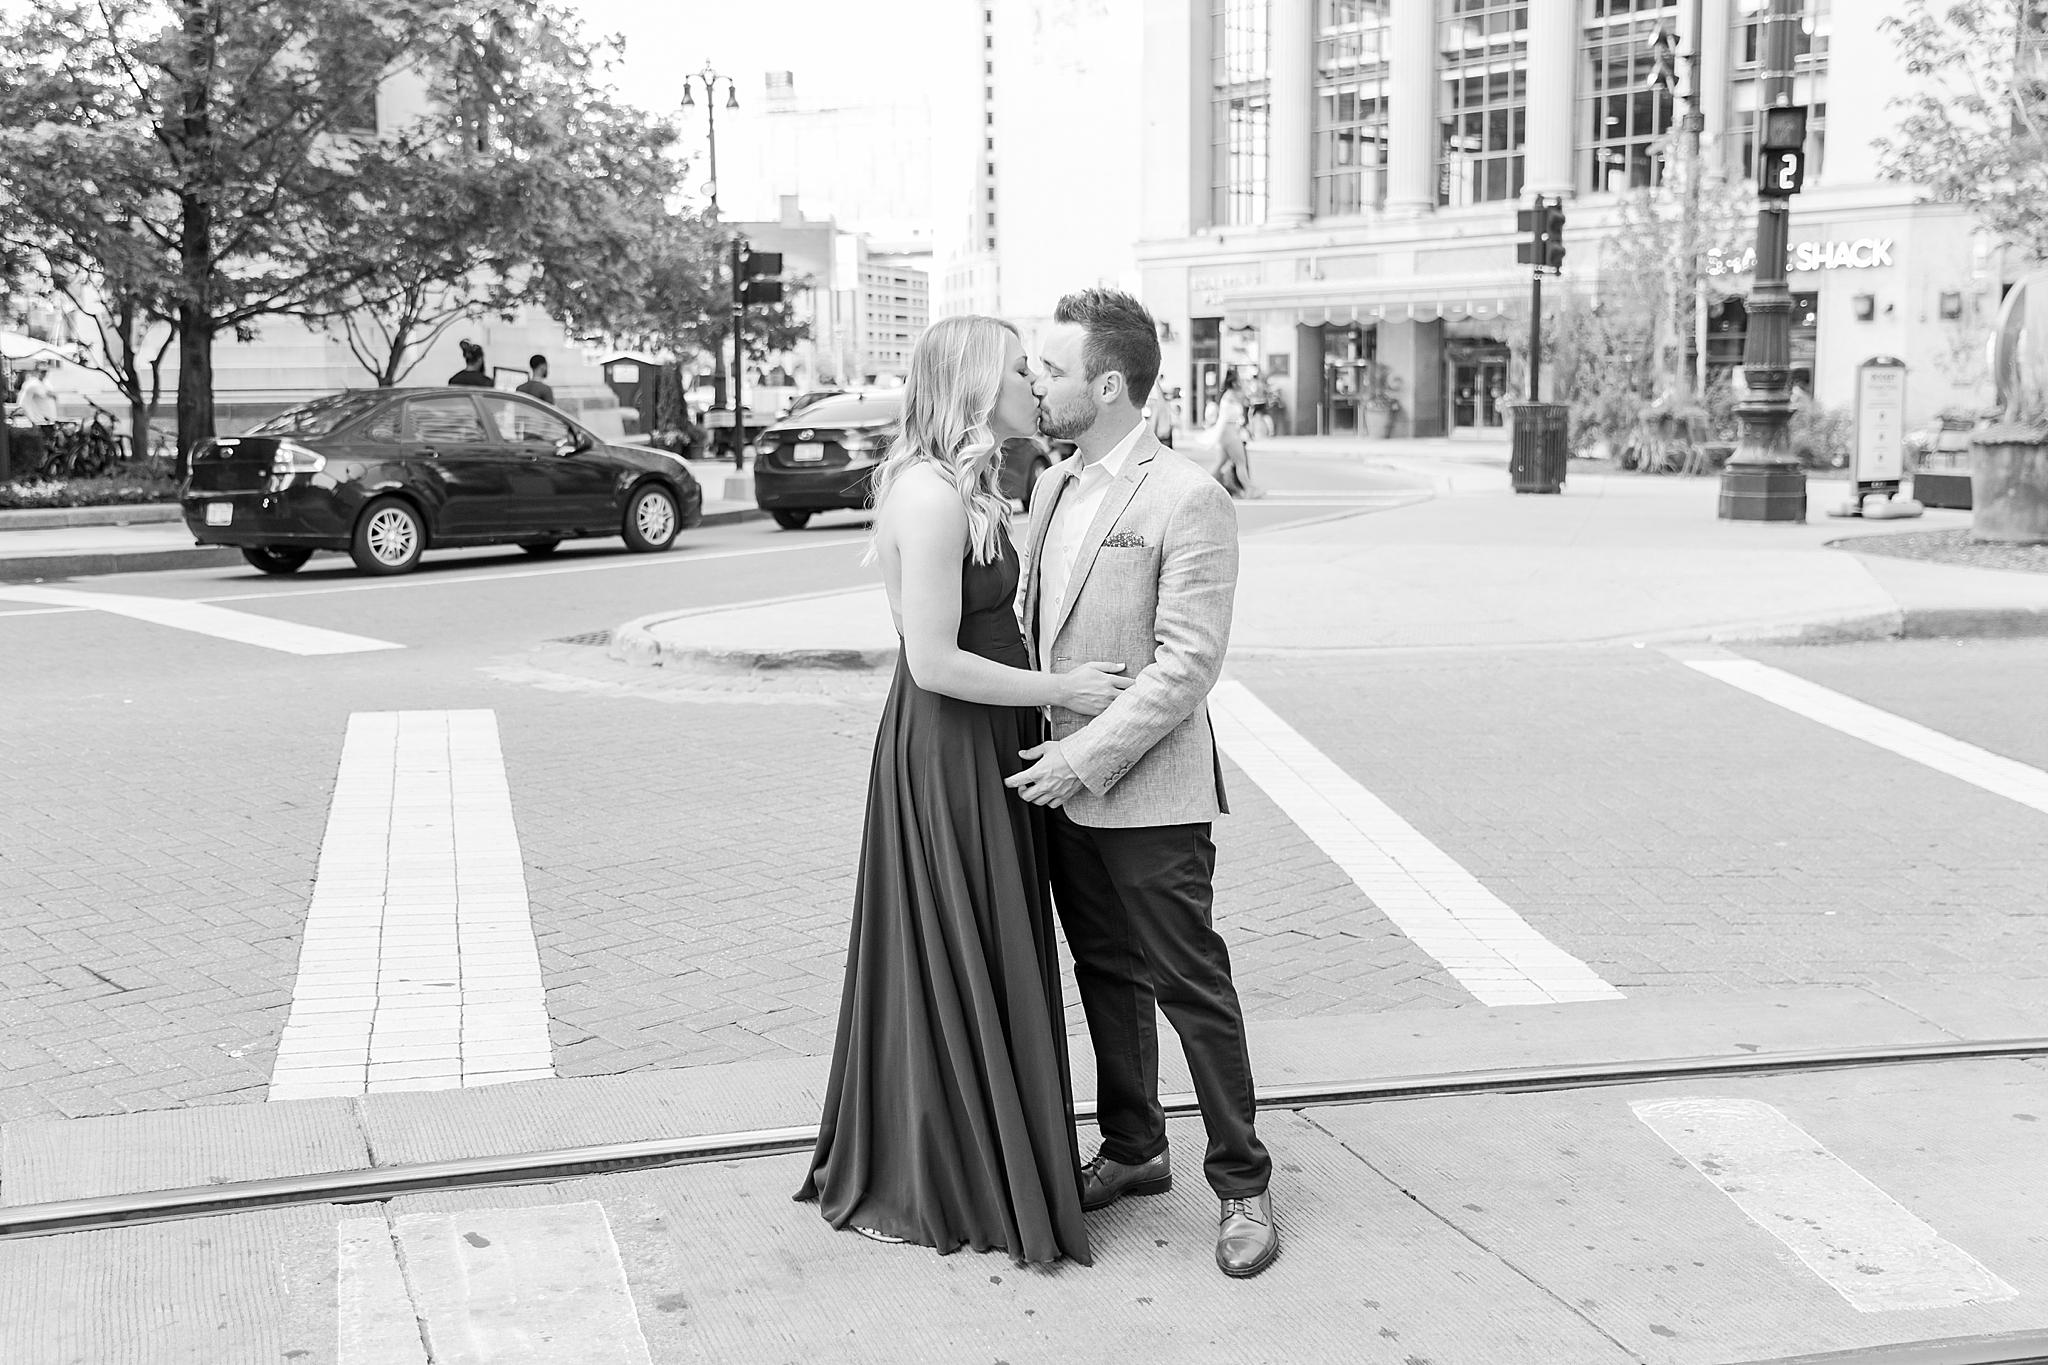 detroit-wedding-photographer-downtown-detroit-belle-isle-engagement-photos-sarah-eric-by-courtney-carolyn-photography_0034.jpg